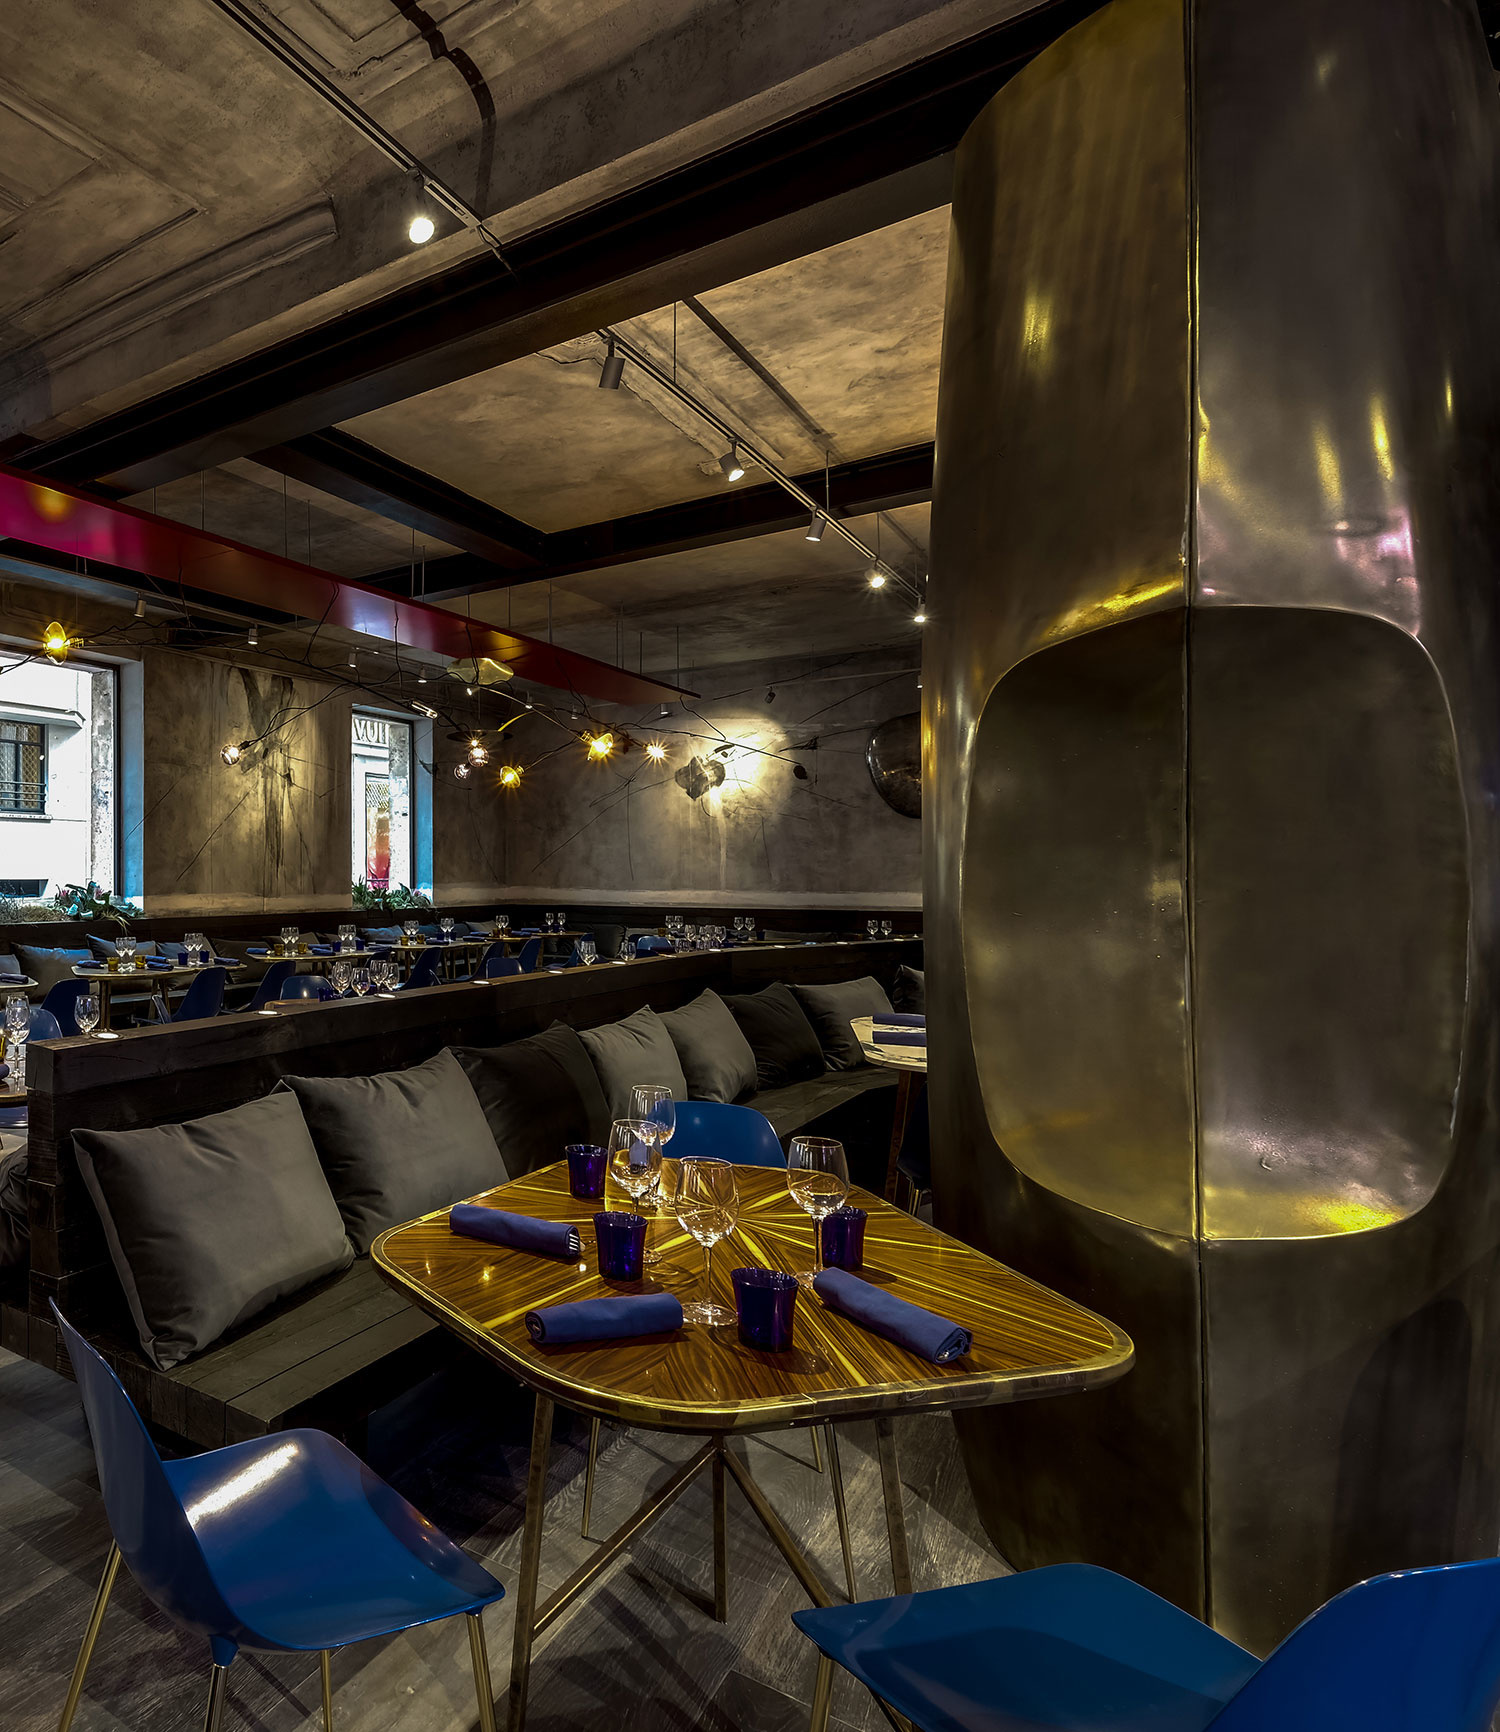 Парижский ресторан Jacopo – проект Натальи Белоноговой (галерея 8, фото 0)